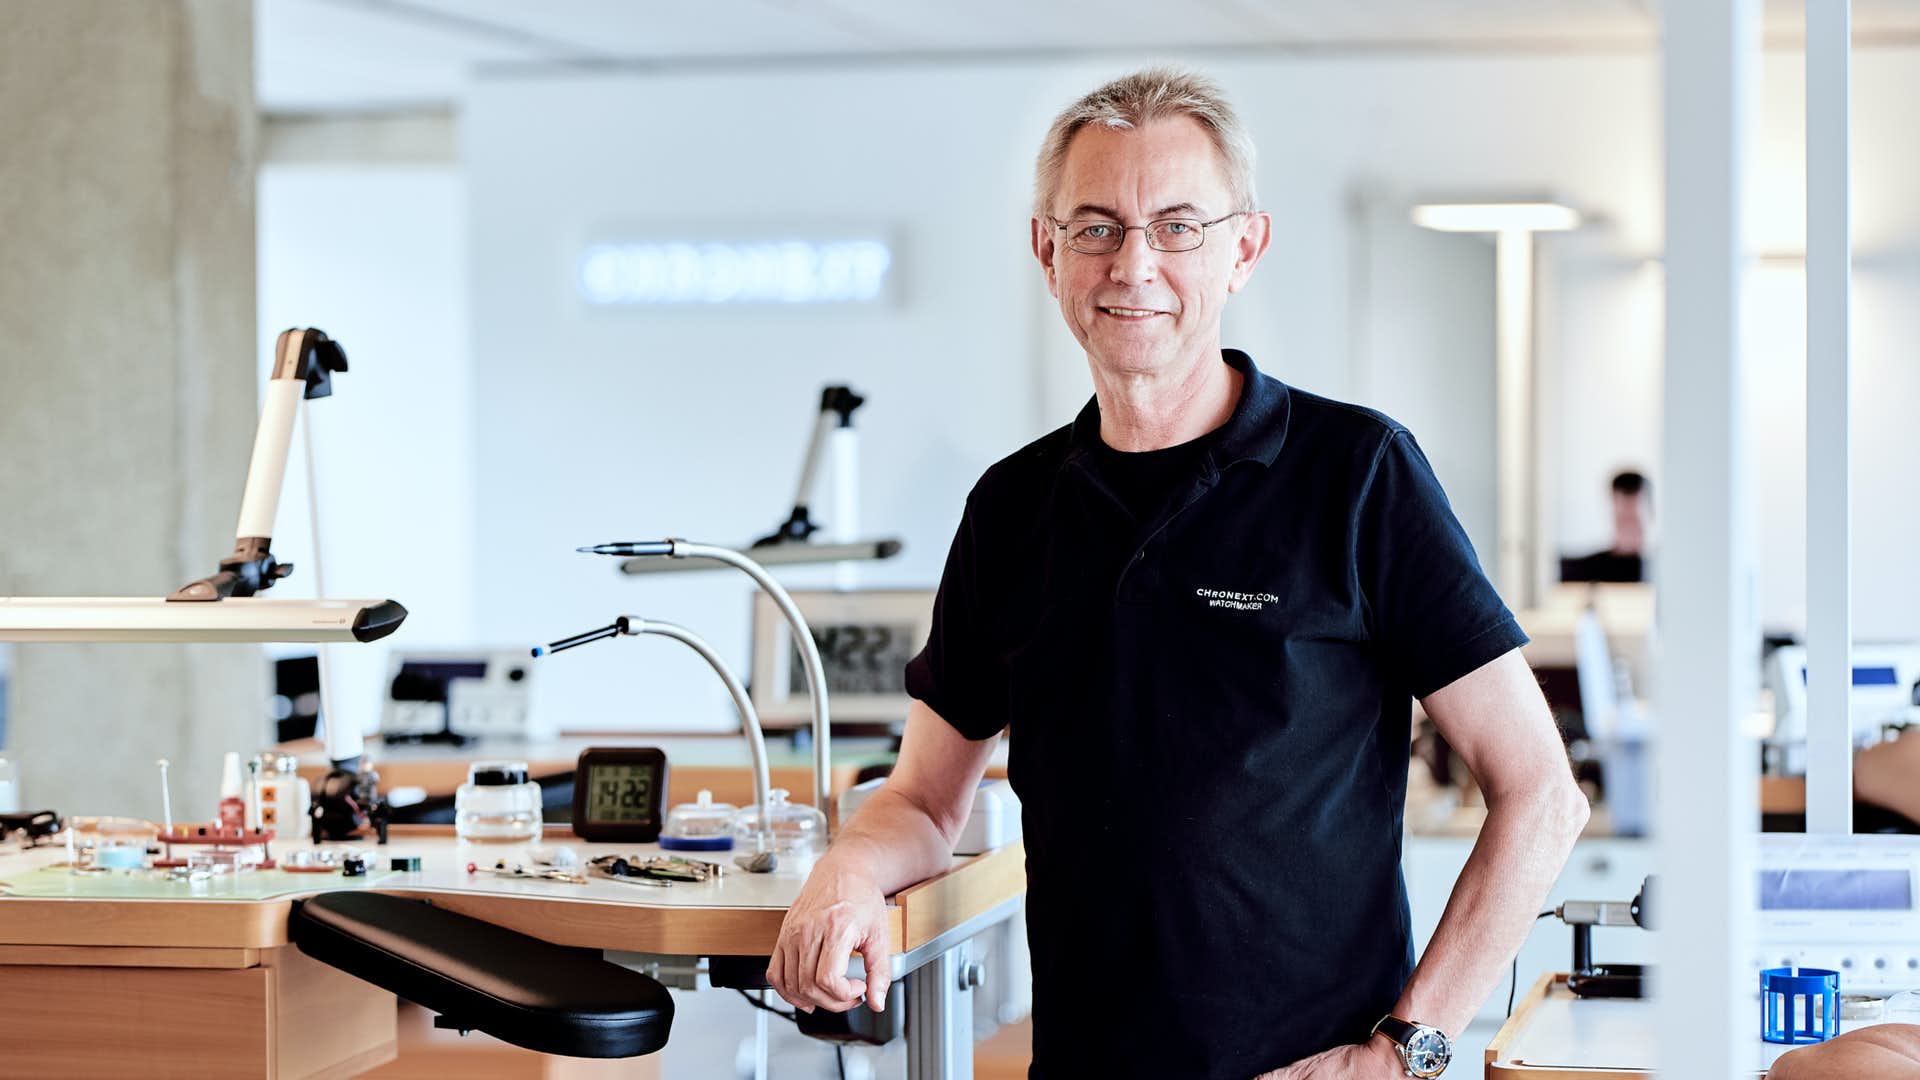 Master Watchmaker Karl-Heinz H. - The Teamleader